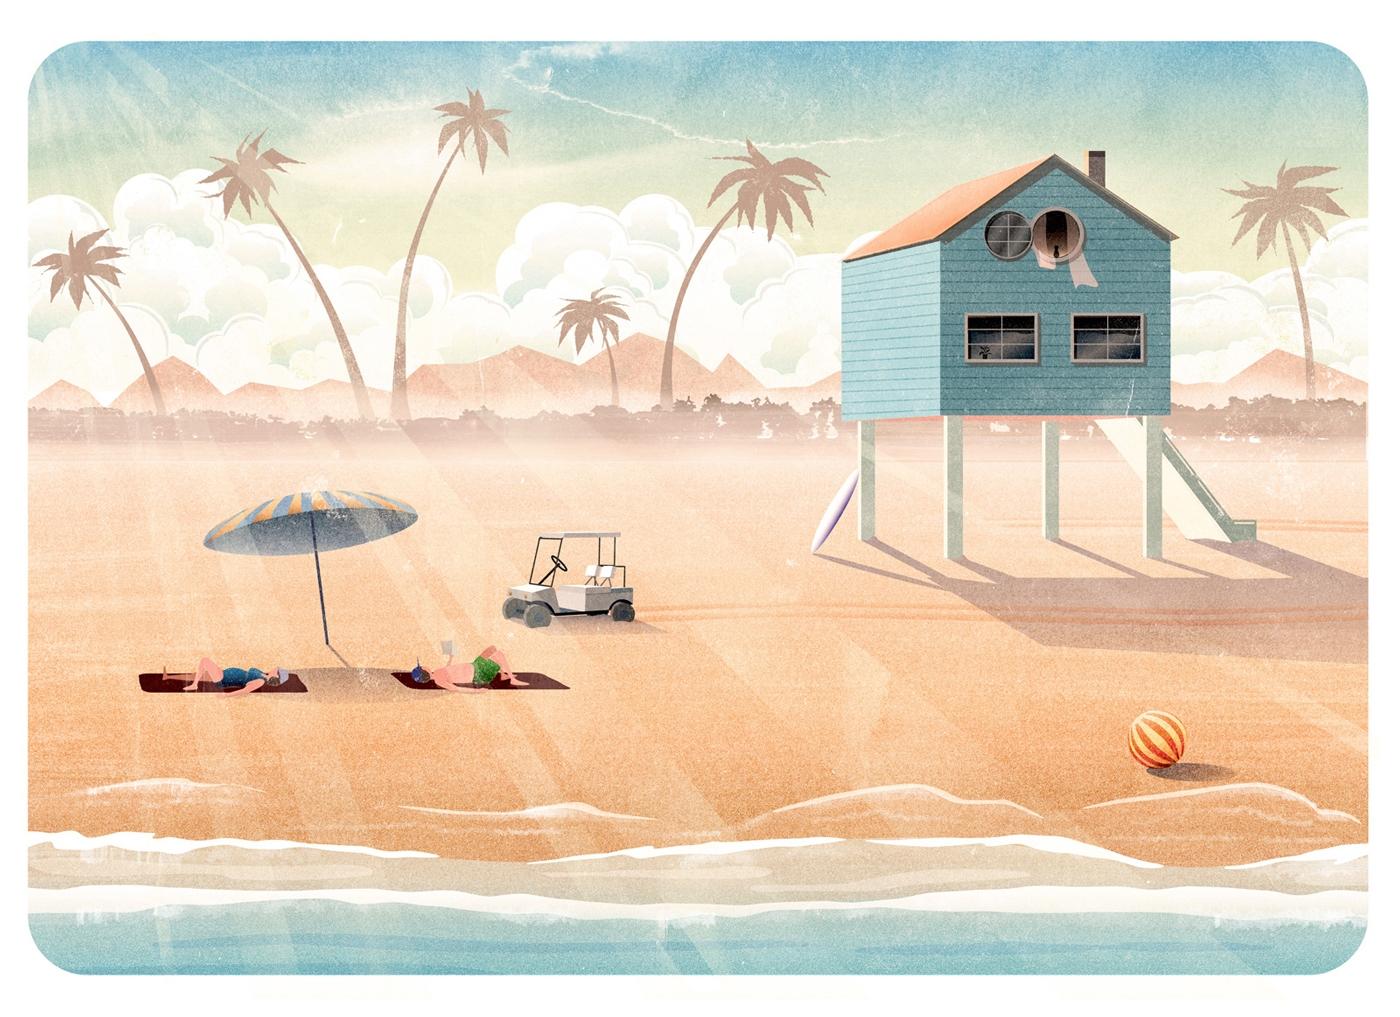 Dreaming beach holiday - illustration - mathildaholmqvist | ello